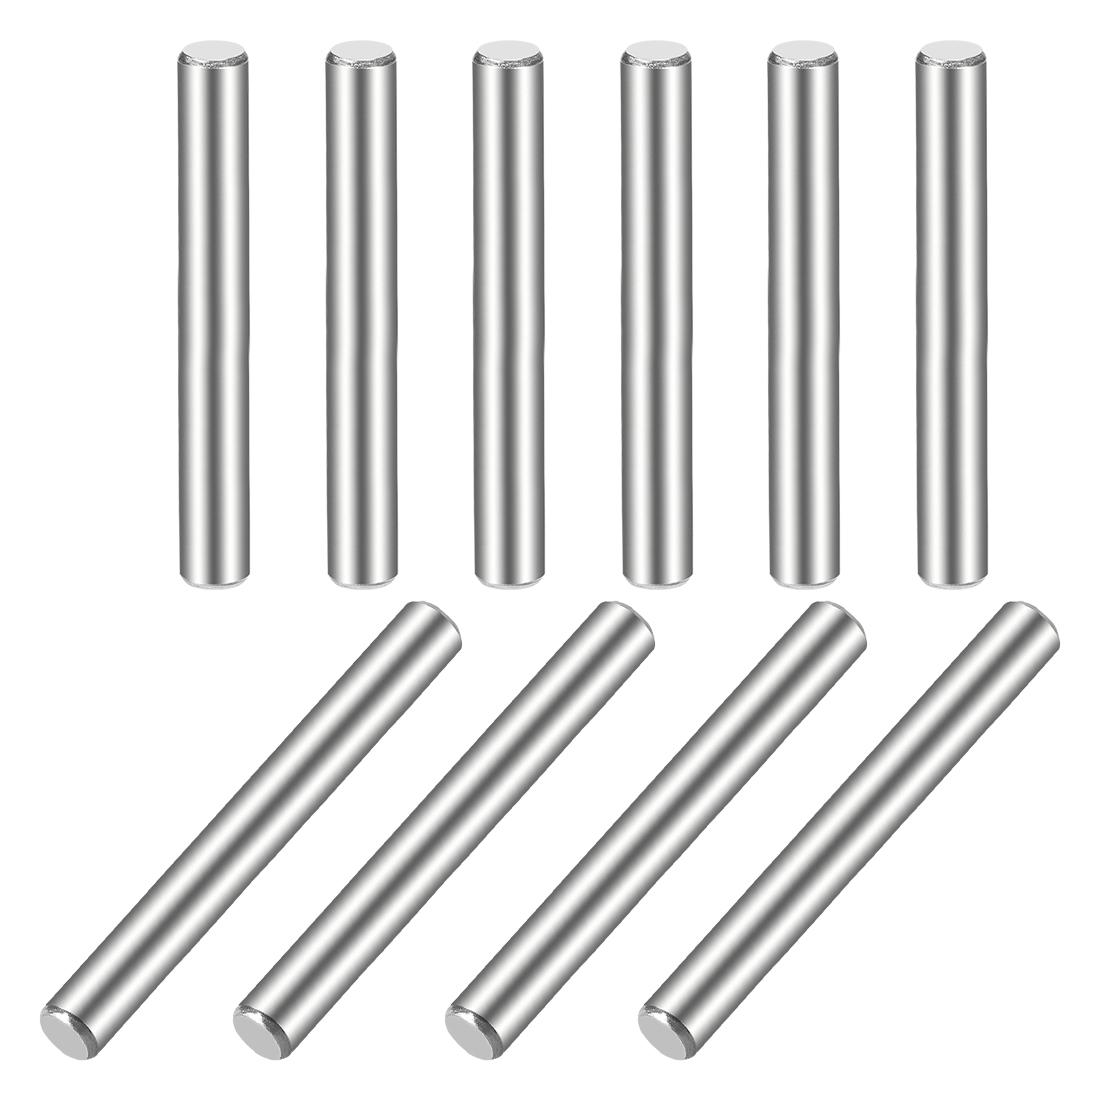 10Pcs 5mm x 55mm Dowel Pin 304 Stainless Steel Shelf Support Pin Fasten